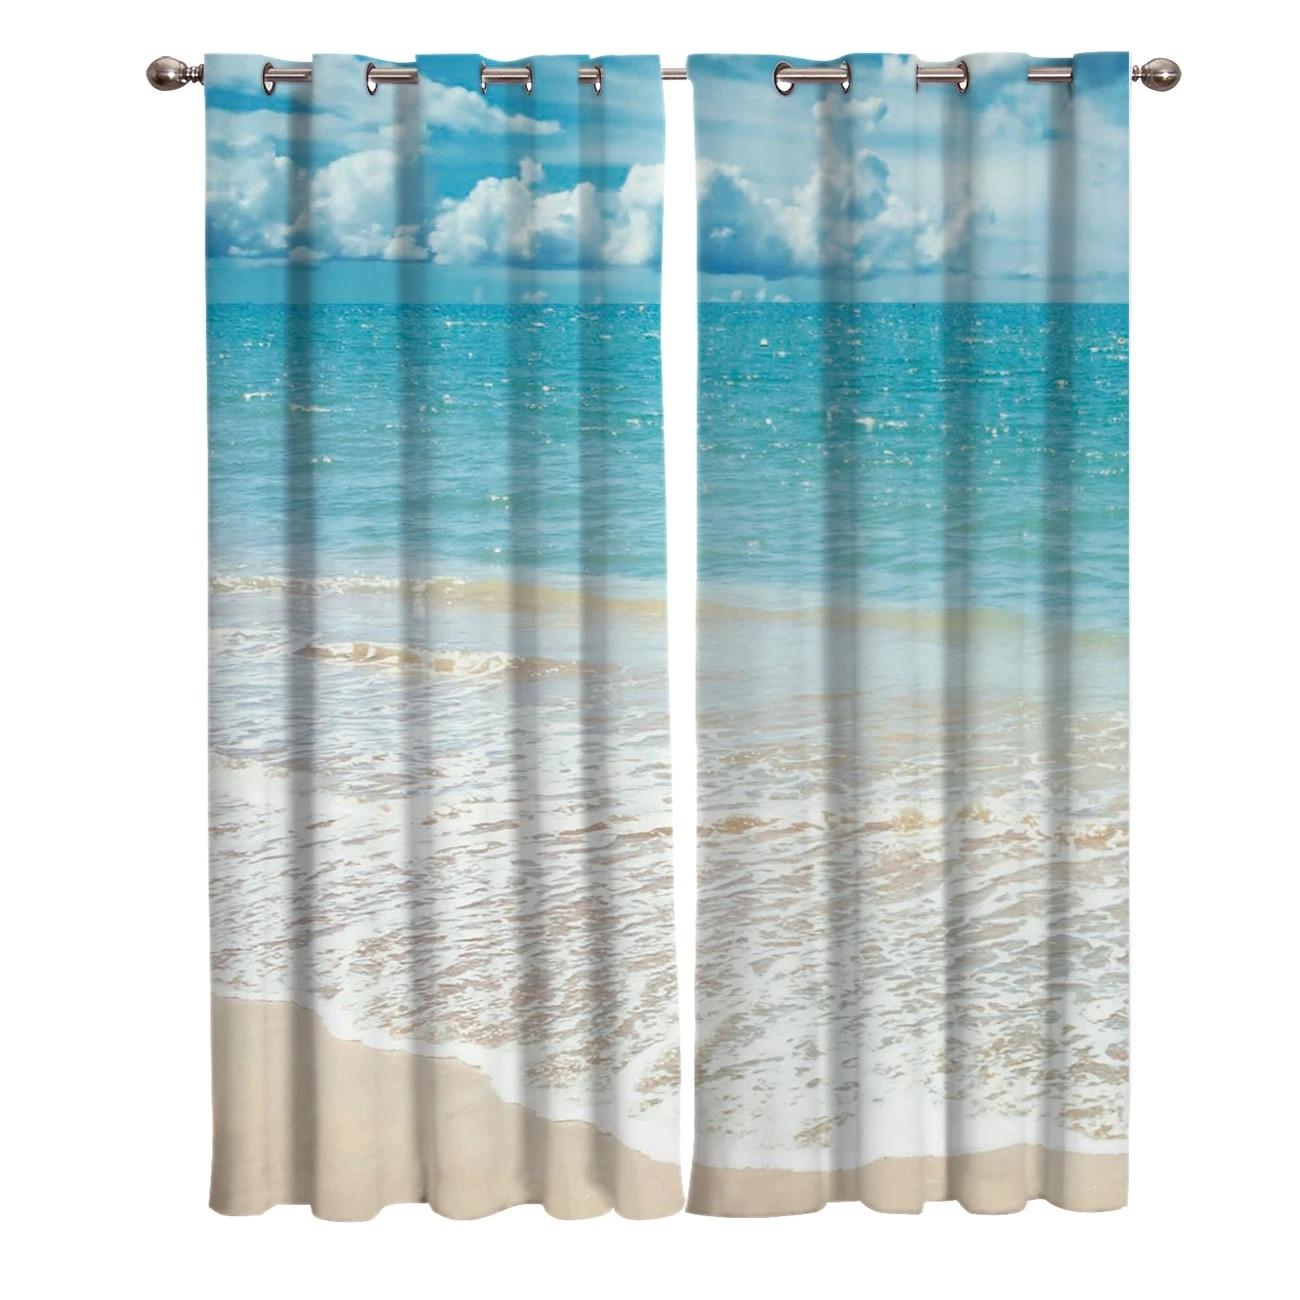 beach sky sea window treatments curtains valance window curtains living room curtain rod kitchen indoor decor kids room curtain